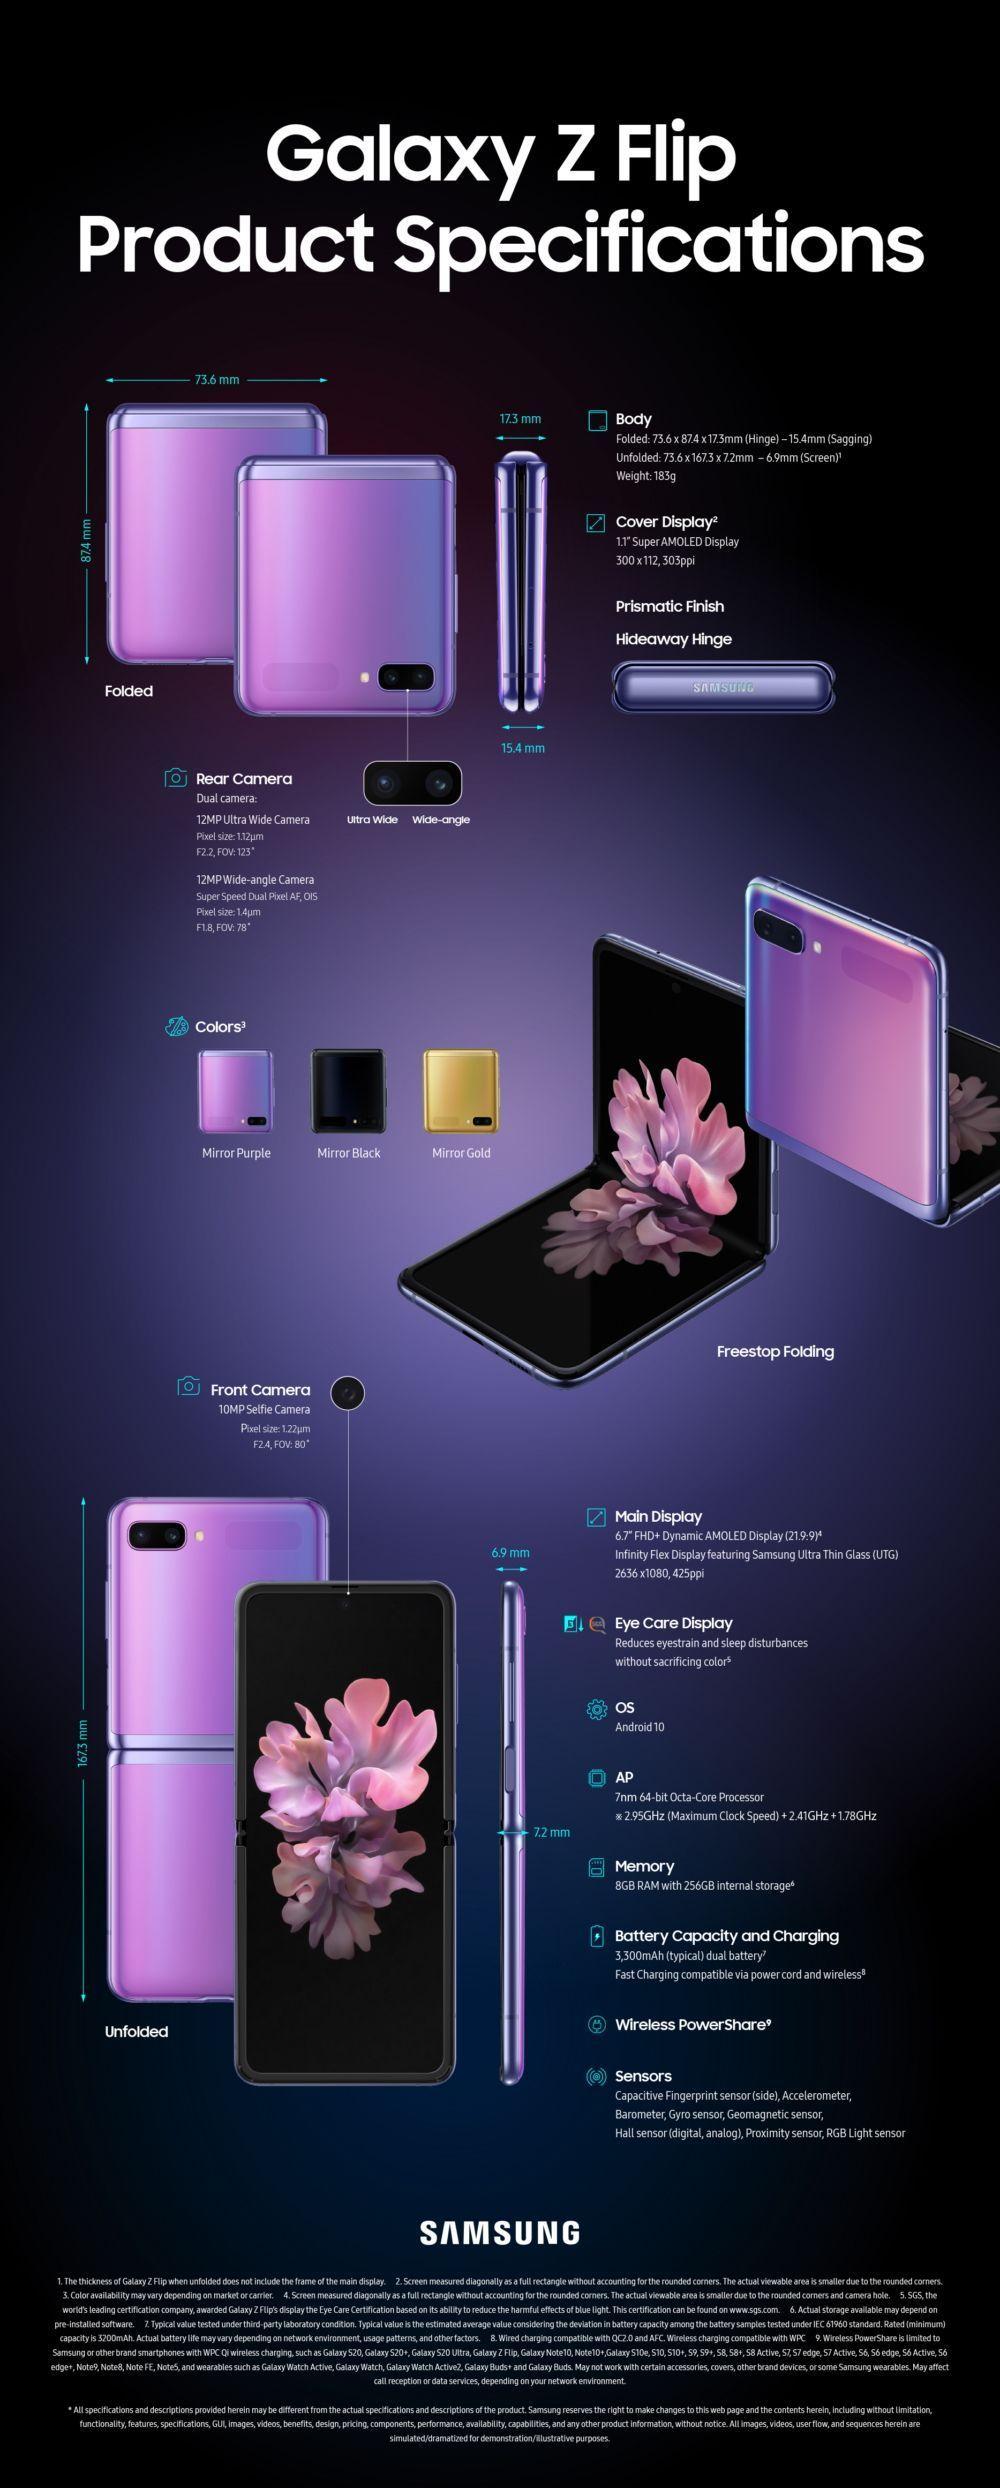 Samsung Galaxy Z Flip Price Features Specs Samsunggalaxyzflip Galaxyzflip Galaxyz In 2020 Motorola Razr Samsung Wallpaper Samsung Galaxy Phones